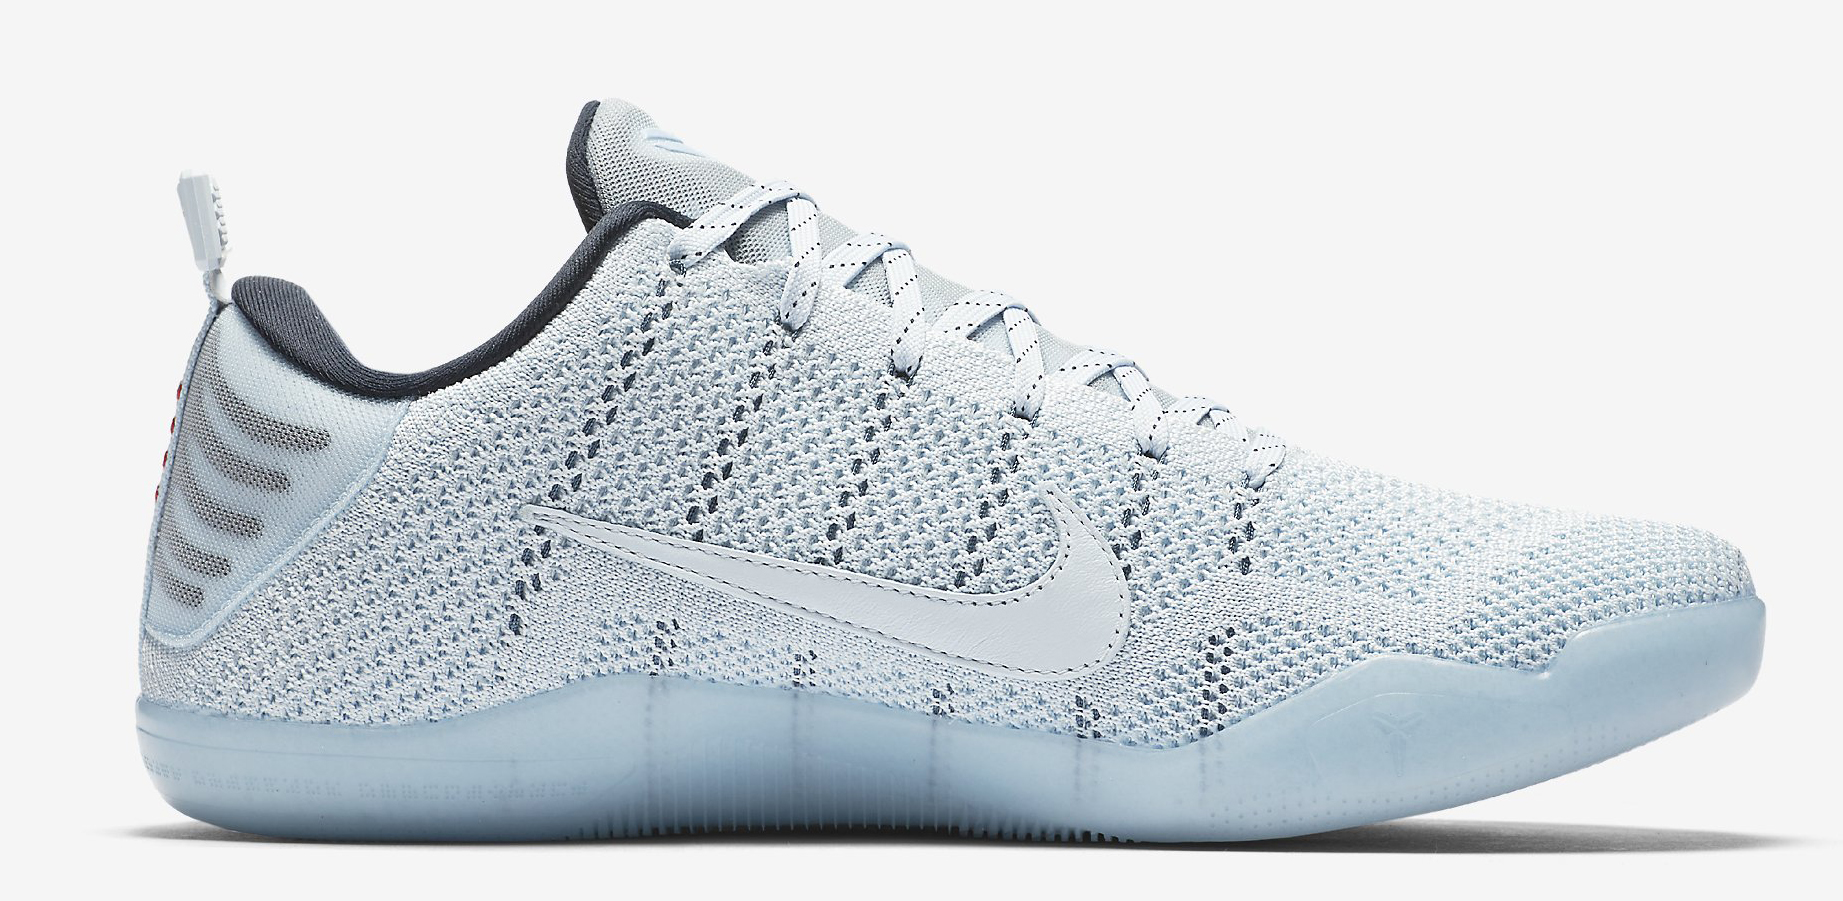 Nike Kobe 11 4KB Pale Horse 824463-443 Medial